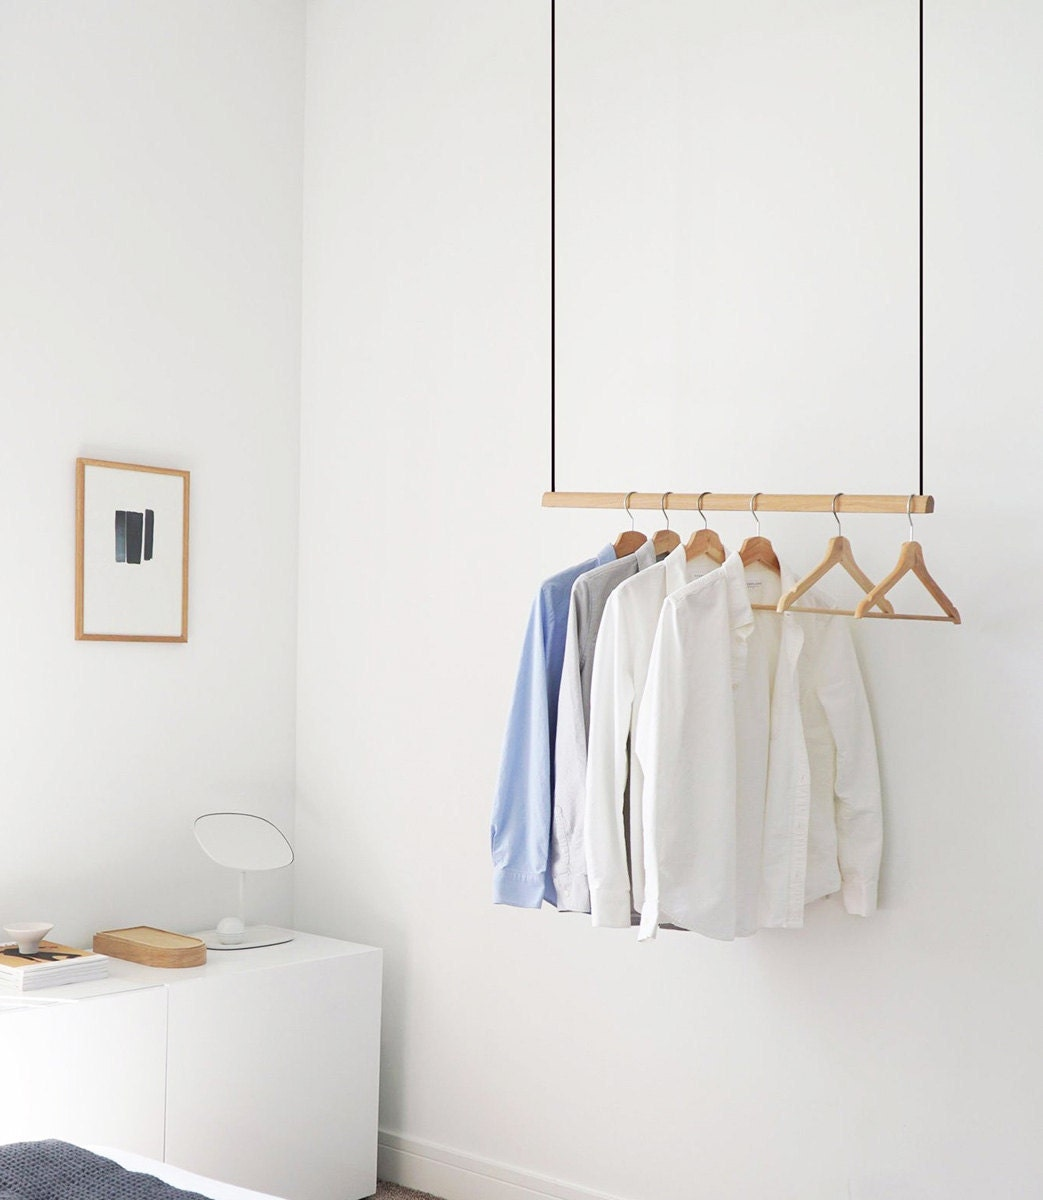 Clothing storage from Etsy